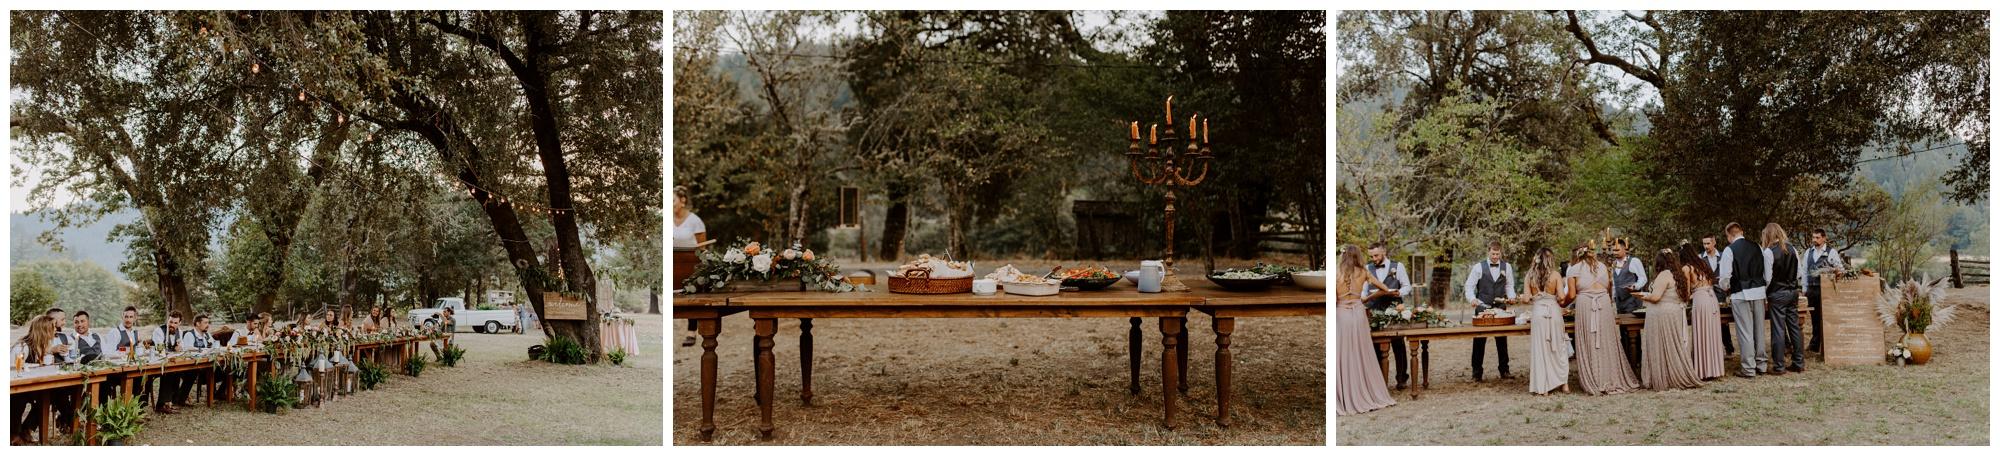 Redwood Festival Wedding Humbolt California - Jessica Heron Images_0068.jpg